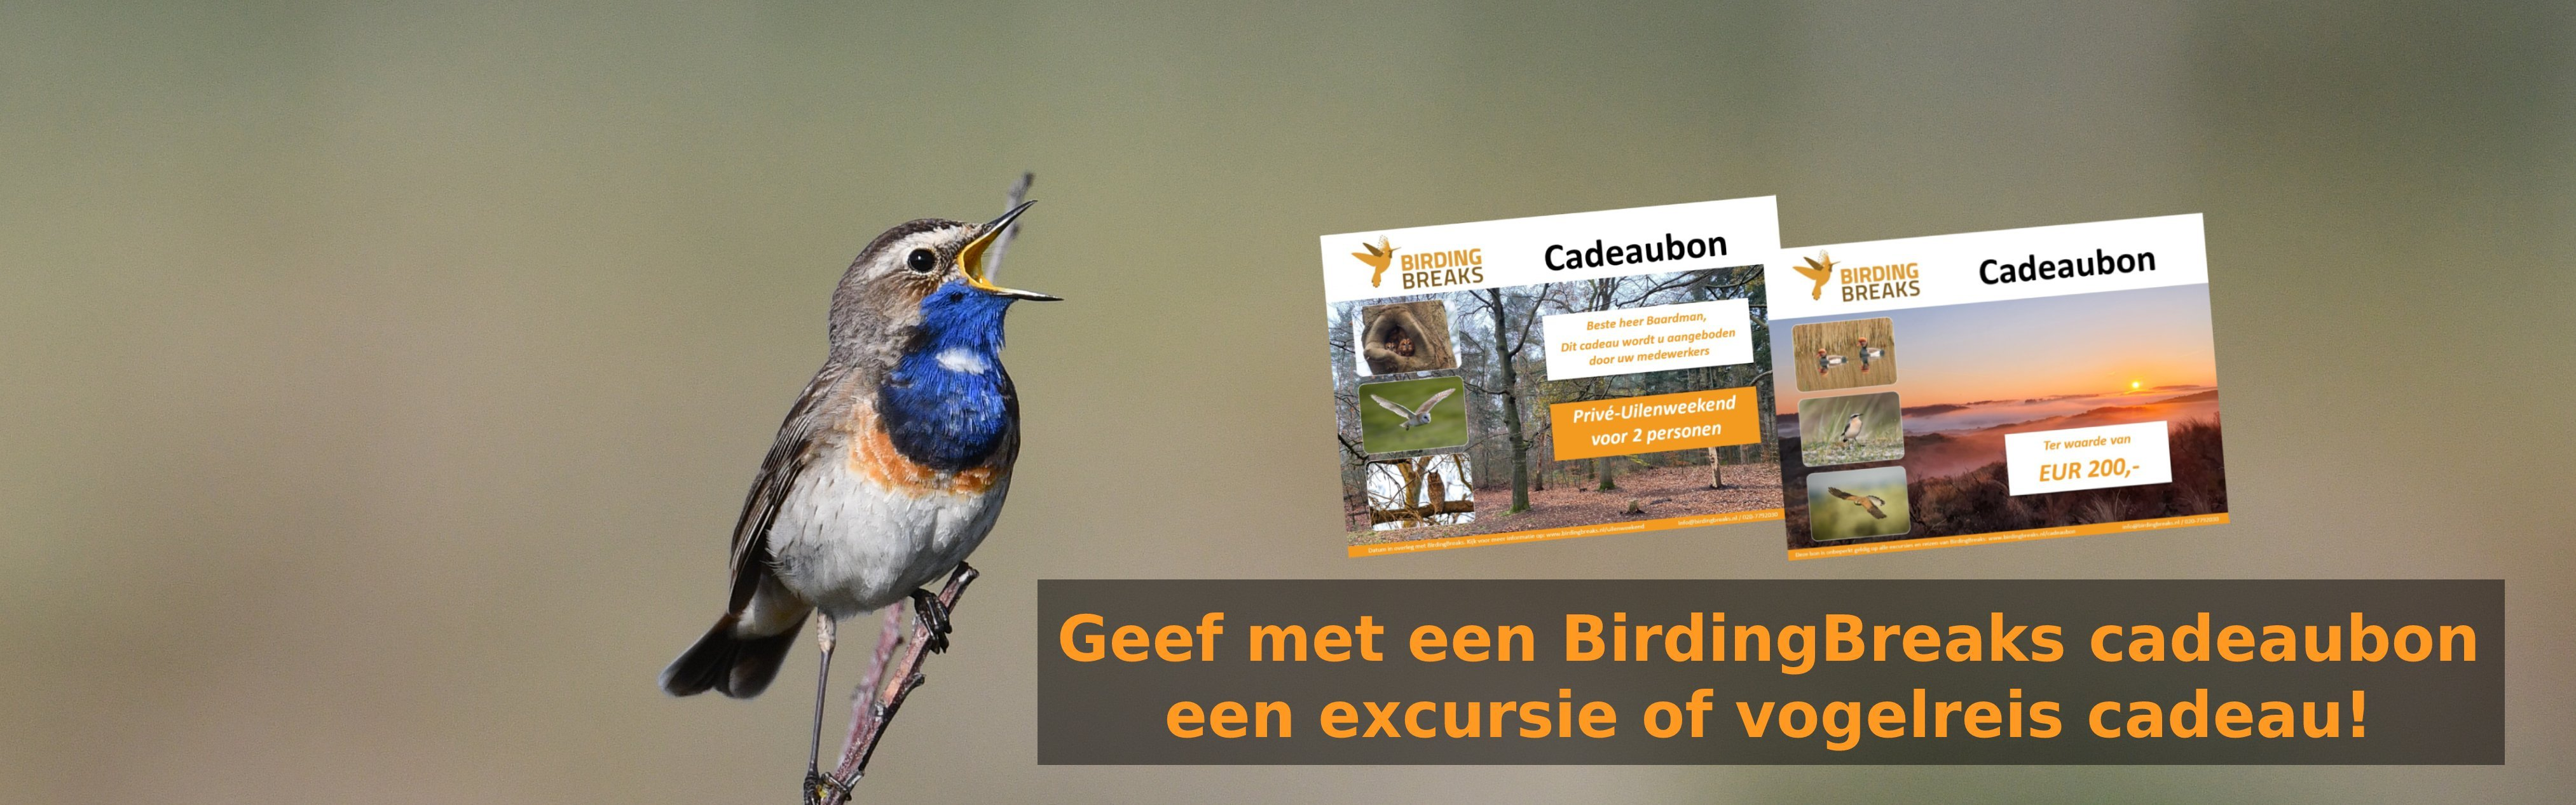 Cadeaubon BirdingBreaks